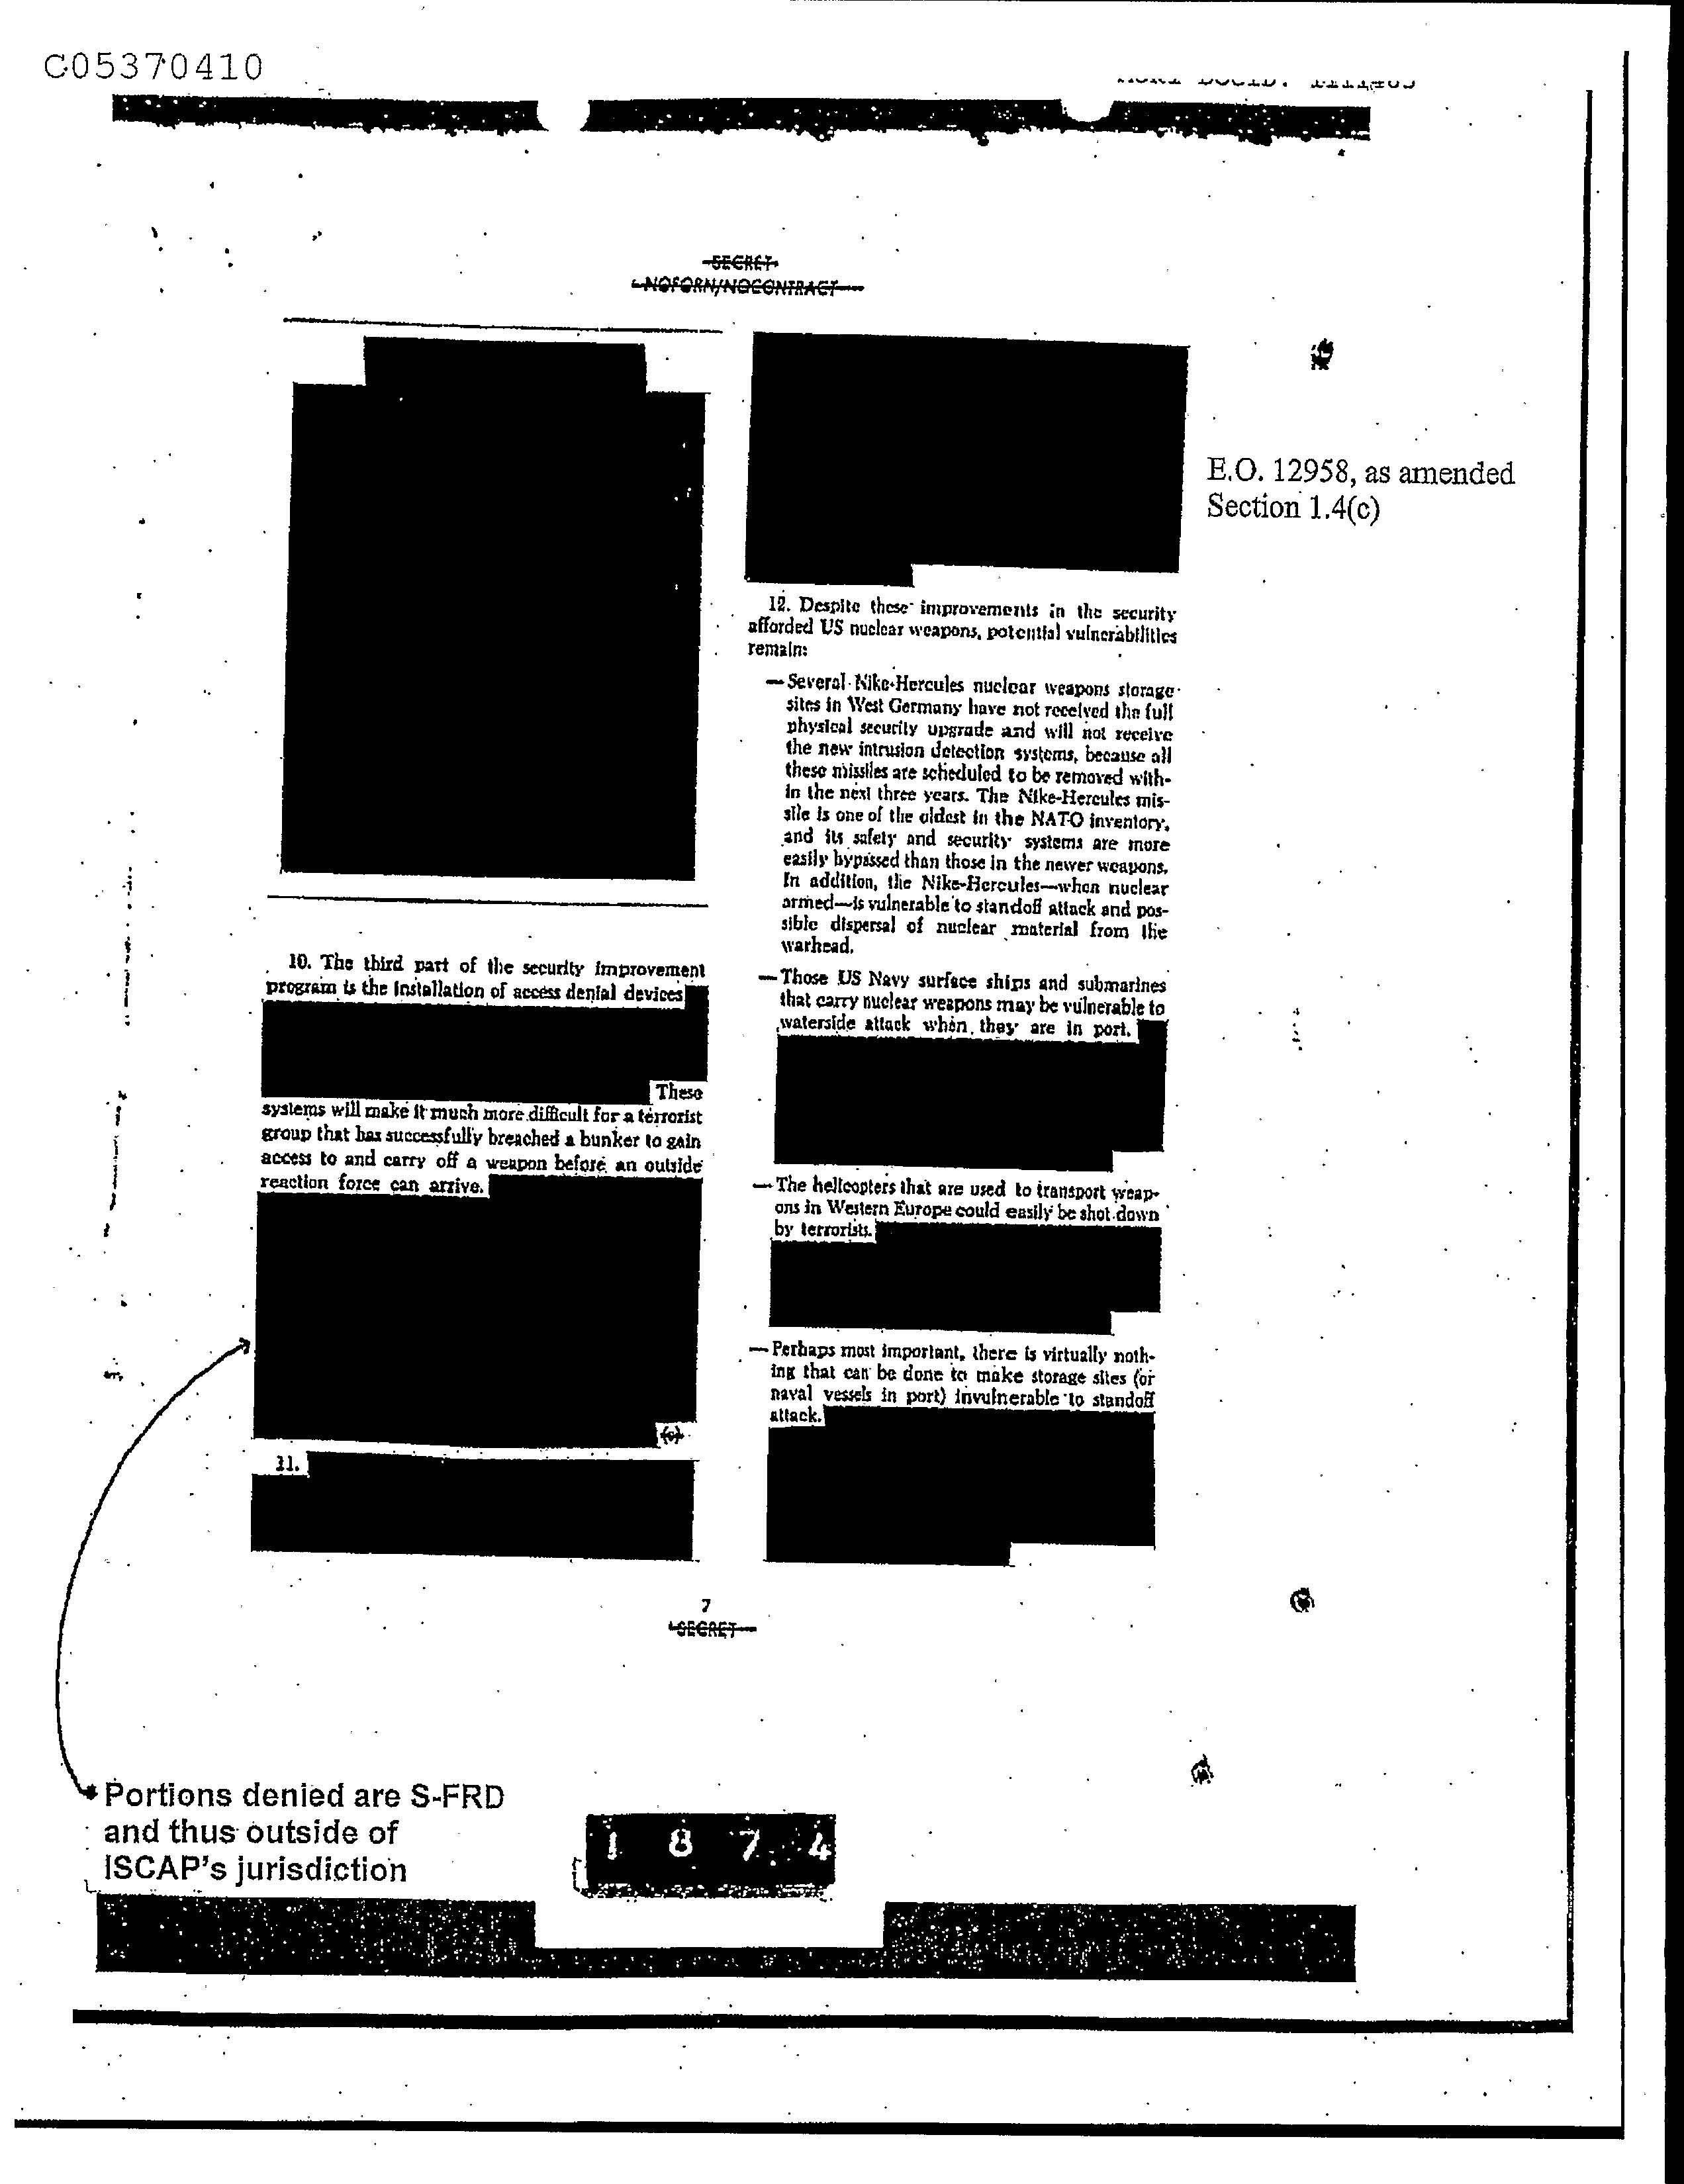 File:Redacted CIA document jpg - Wikimedia Commons